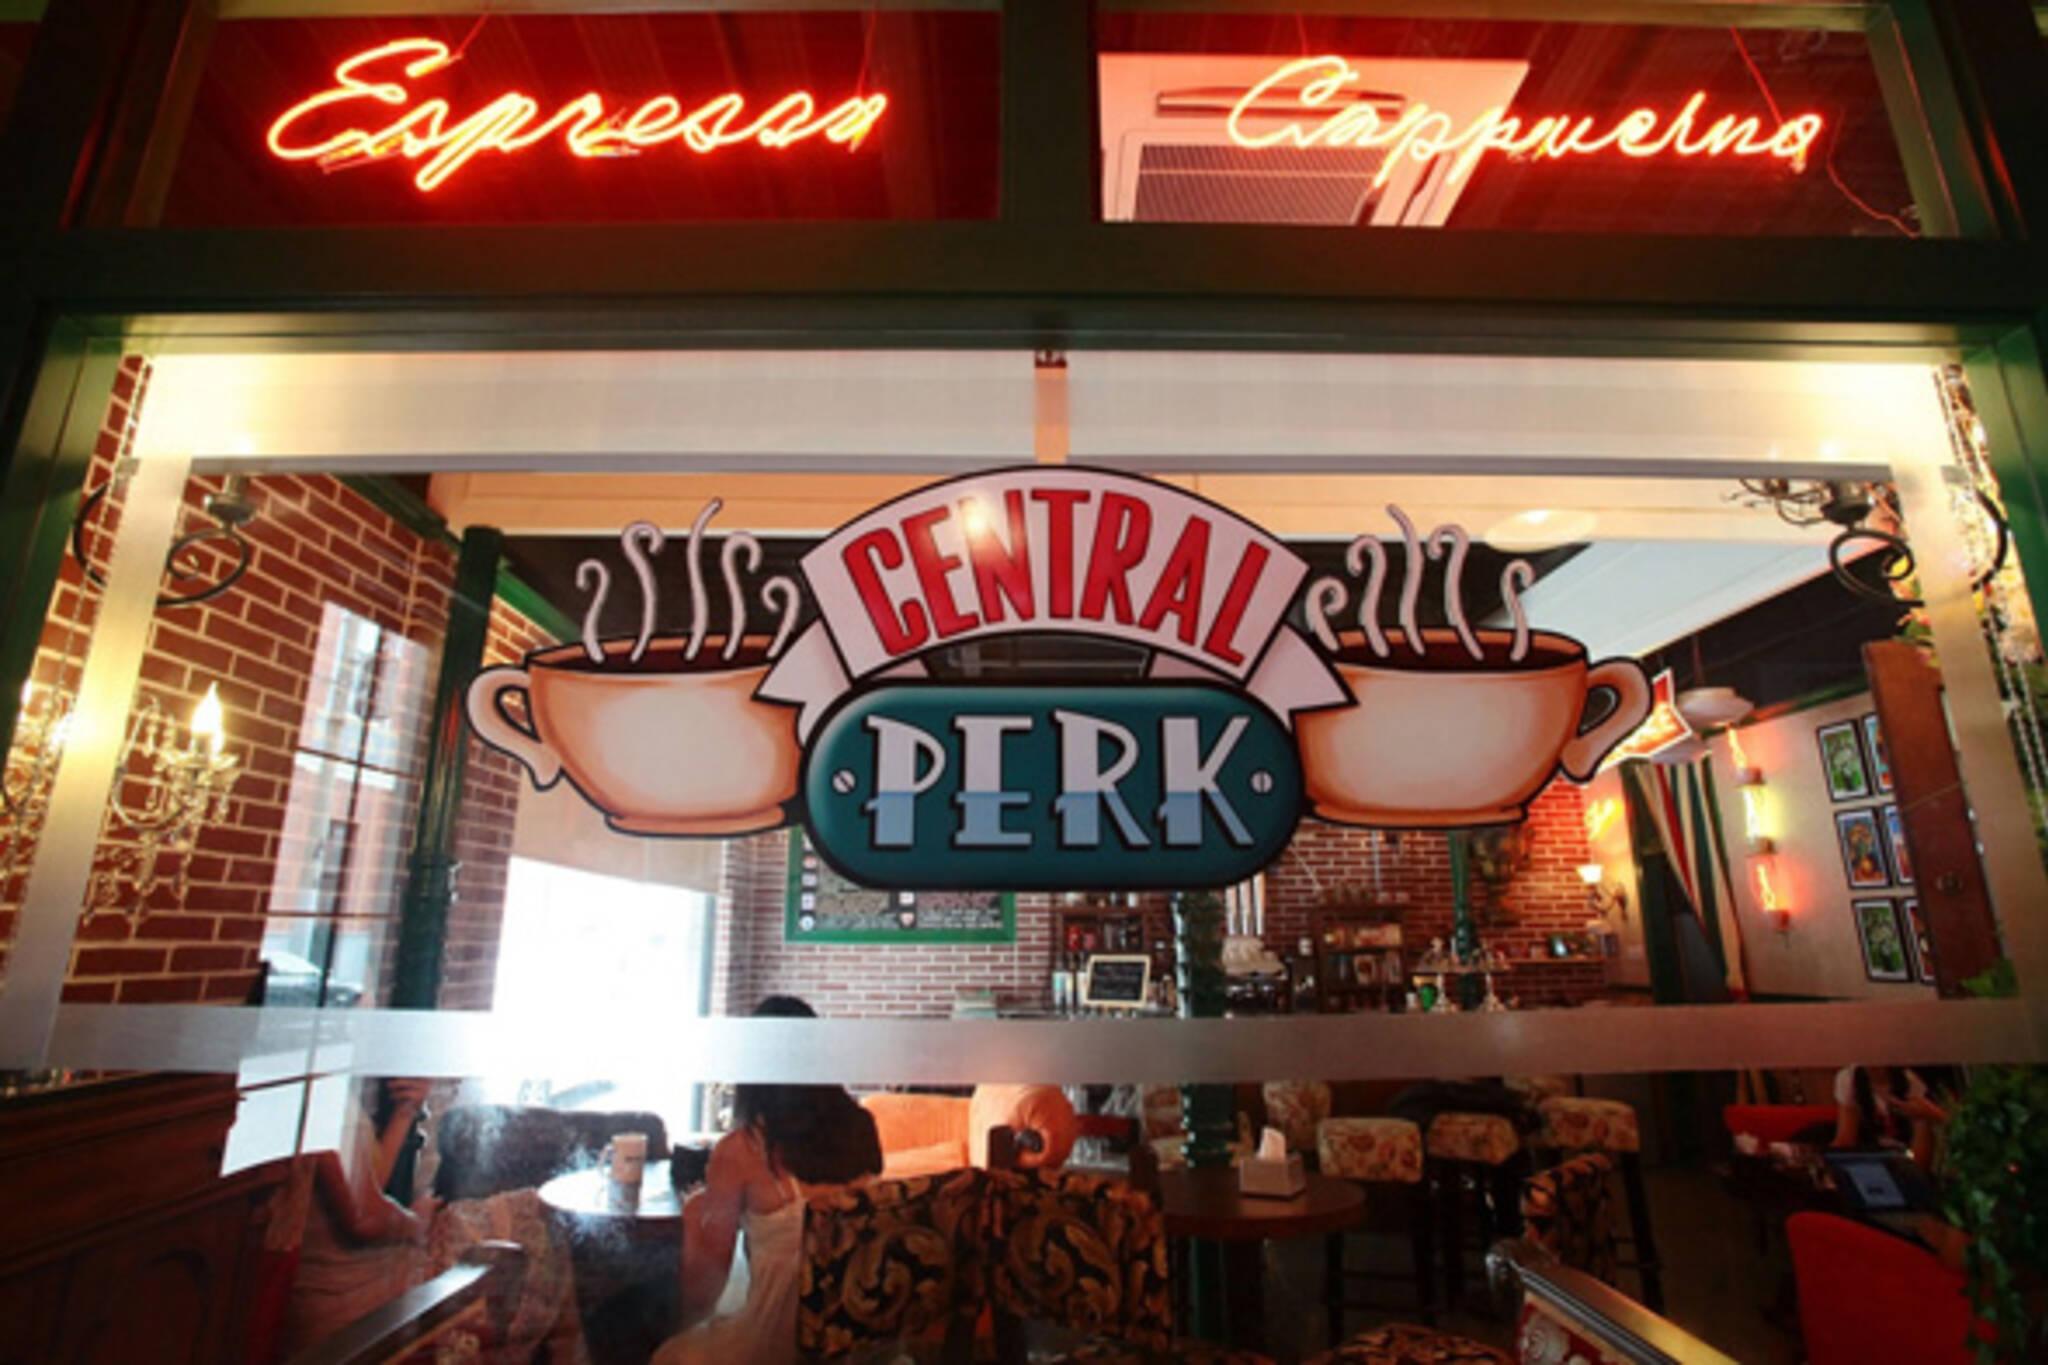 Central Park Cafe Pune